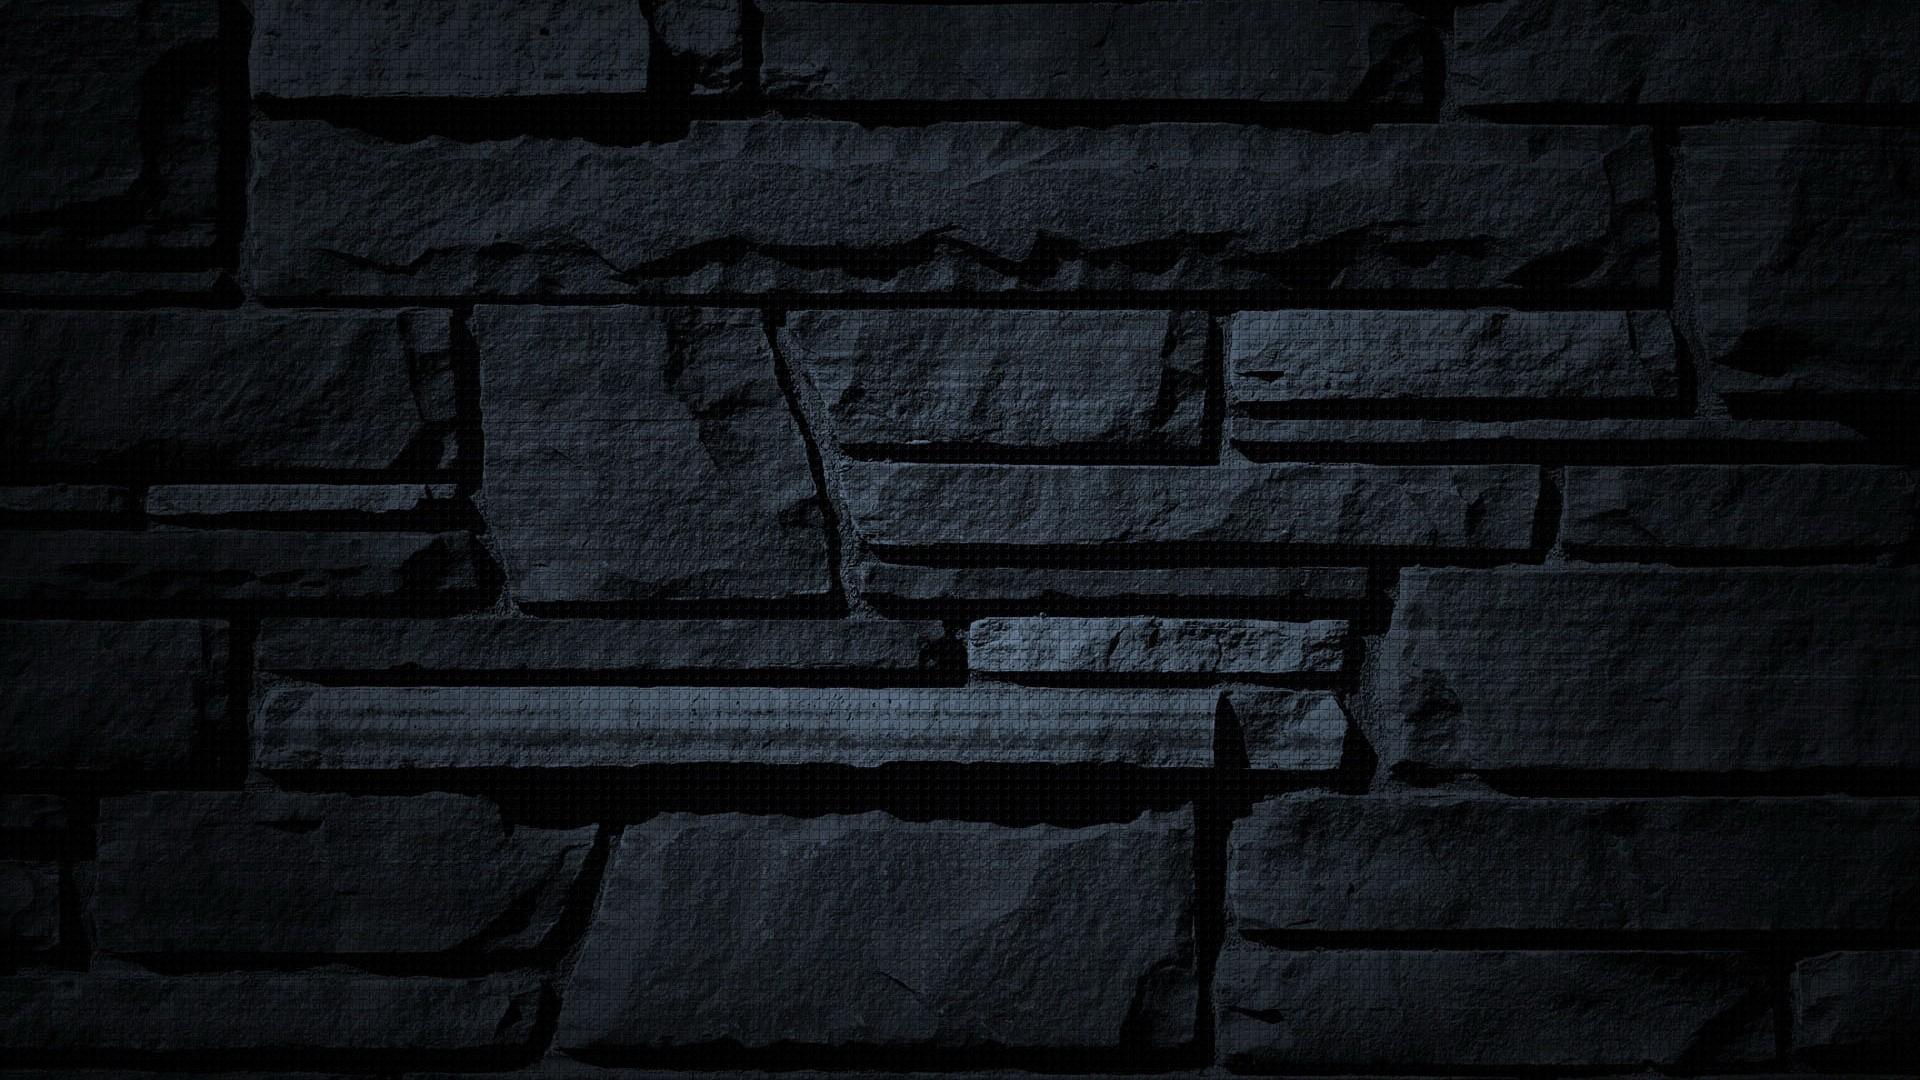 Black Texture wallpaper ·① Download free cool High ...